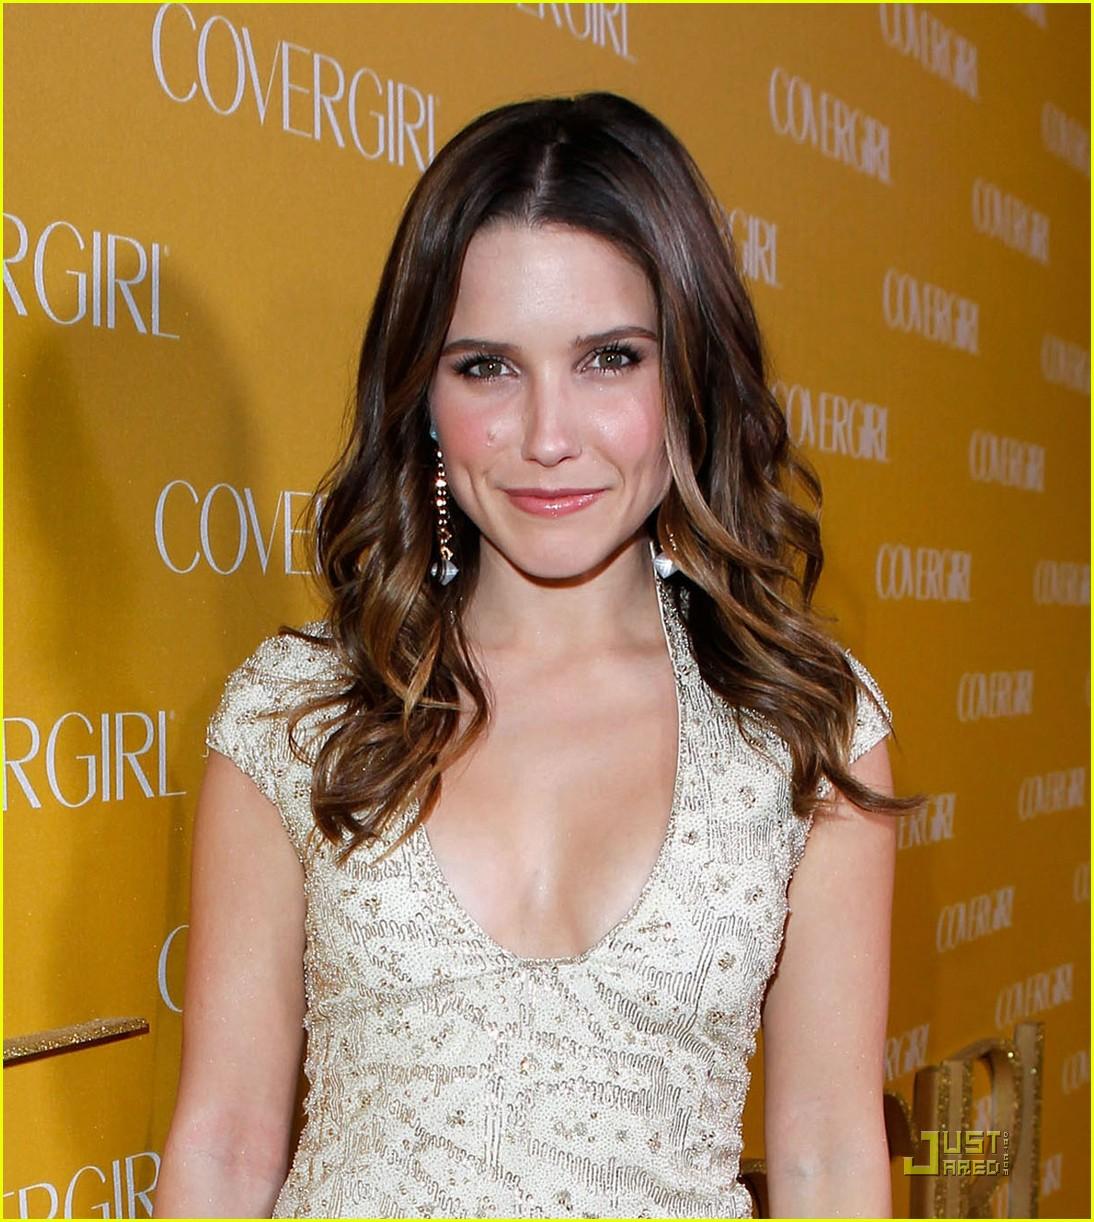 TV Actress Sophia Bush - age: 35